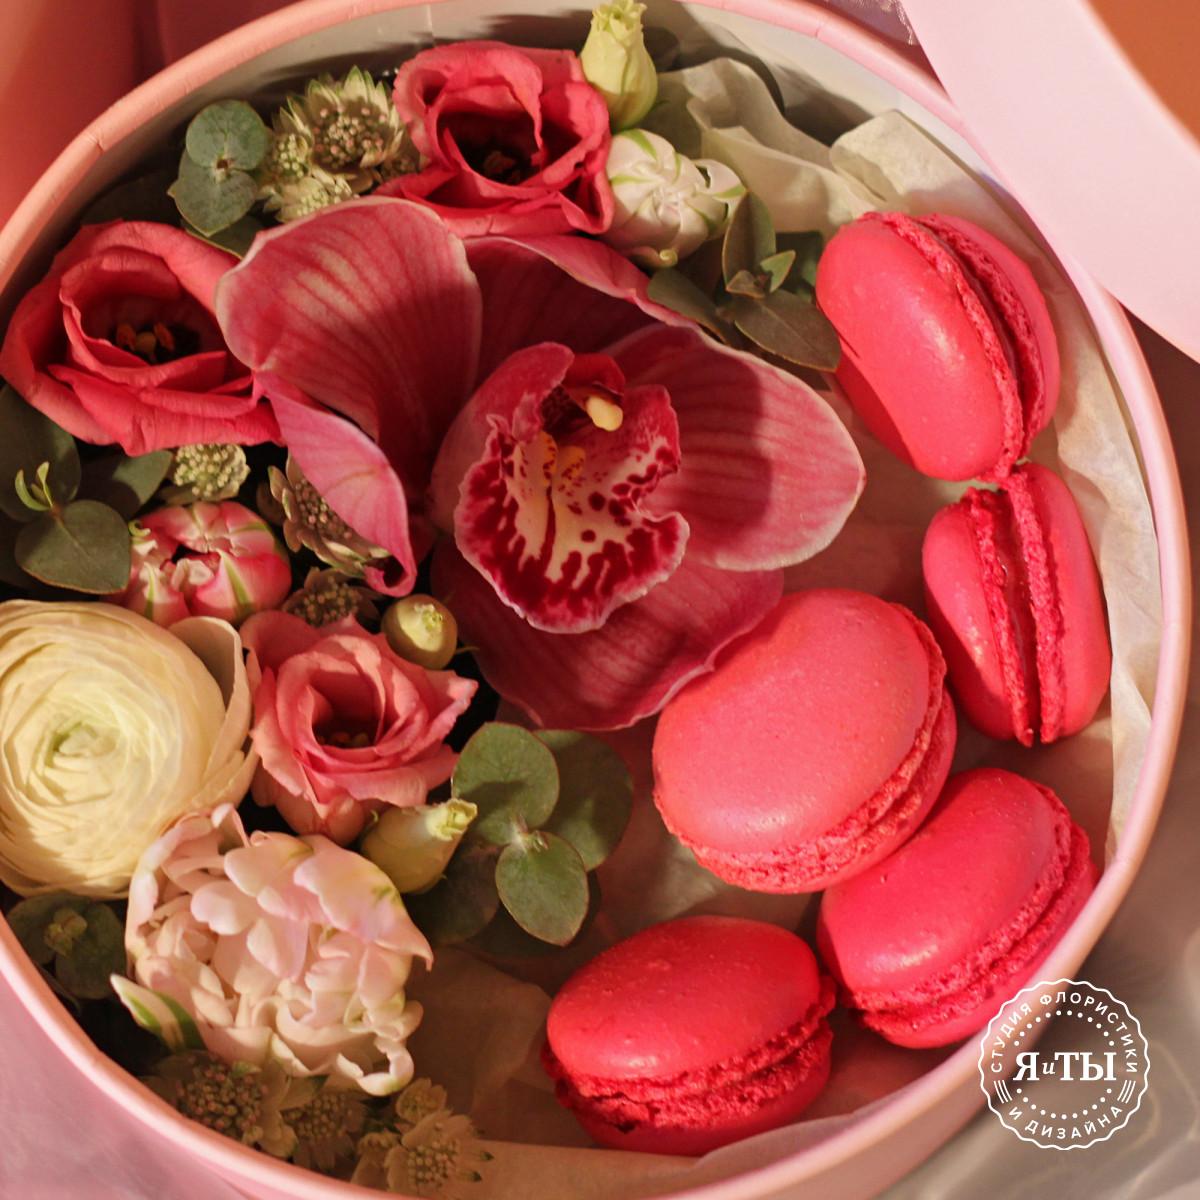 Коробочка с орхидеей и макарони